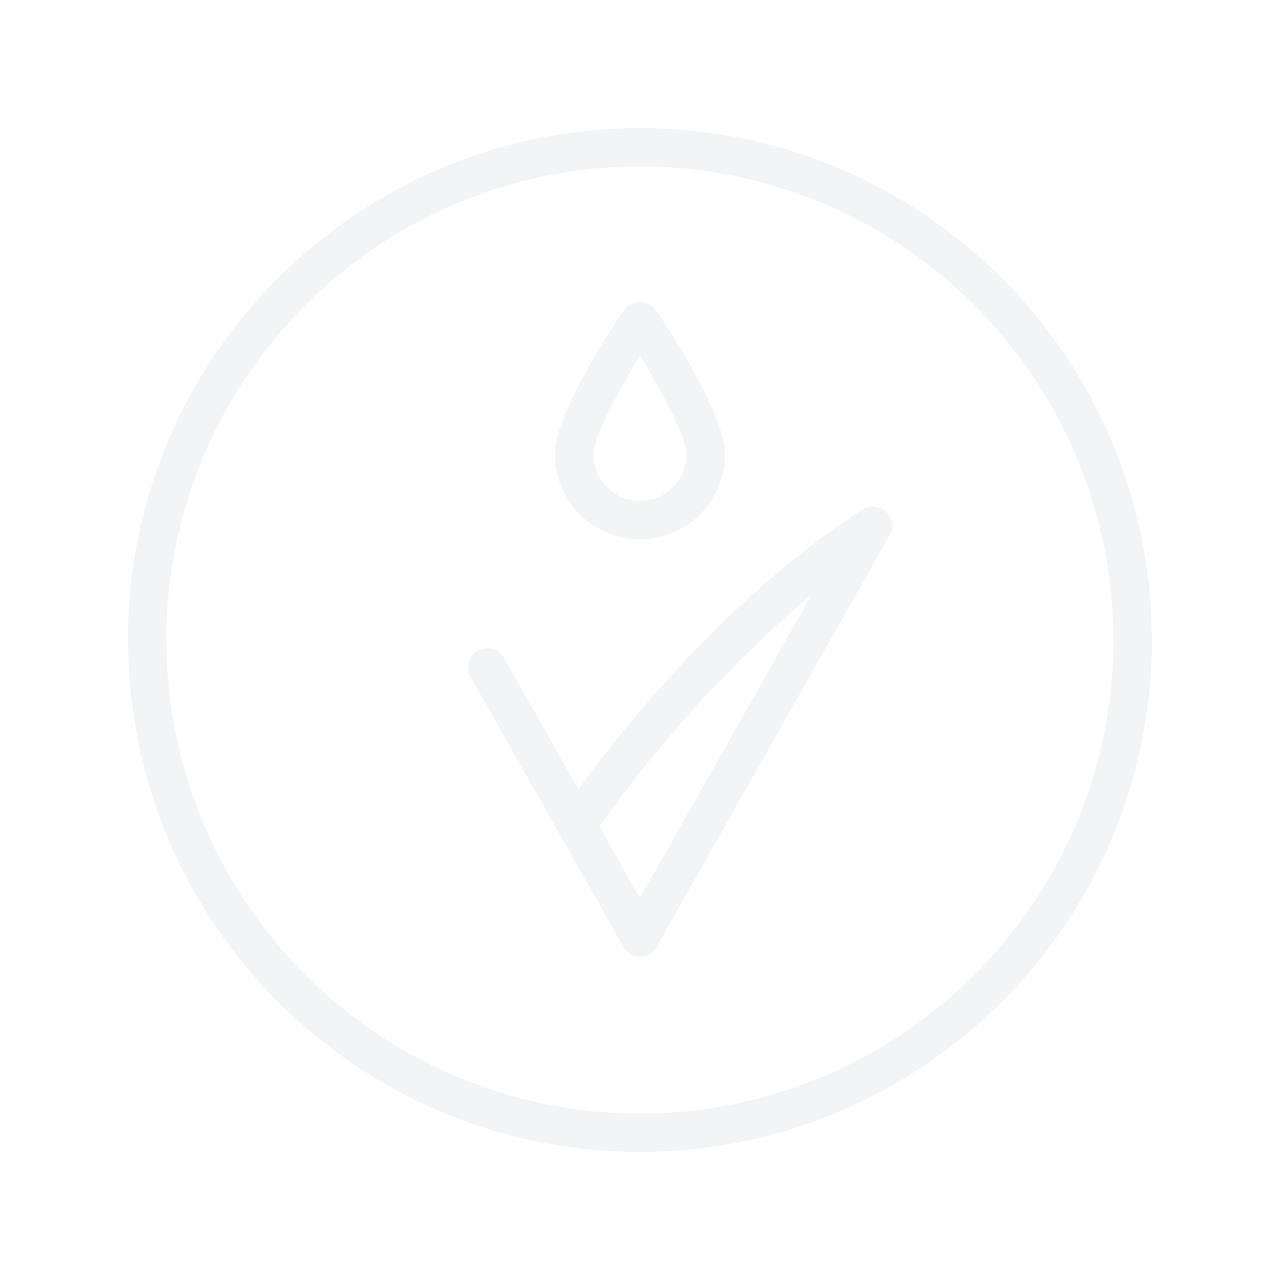 MIZON Joyful Time Essence Royal Jelly Mask 23g